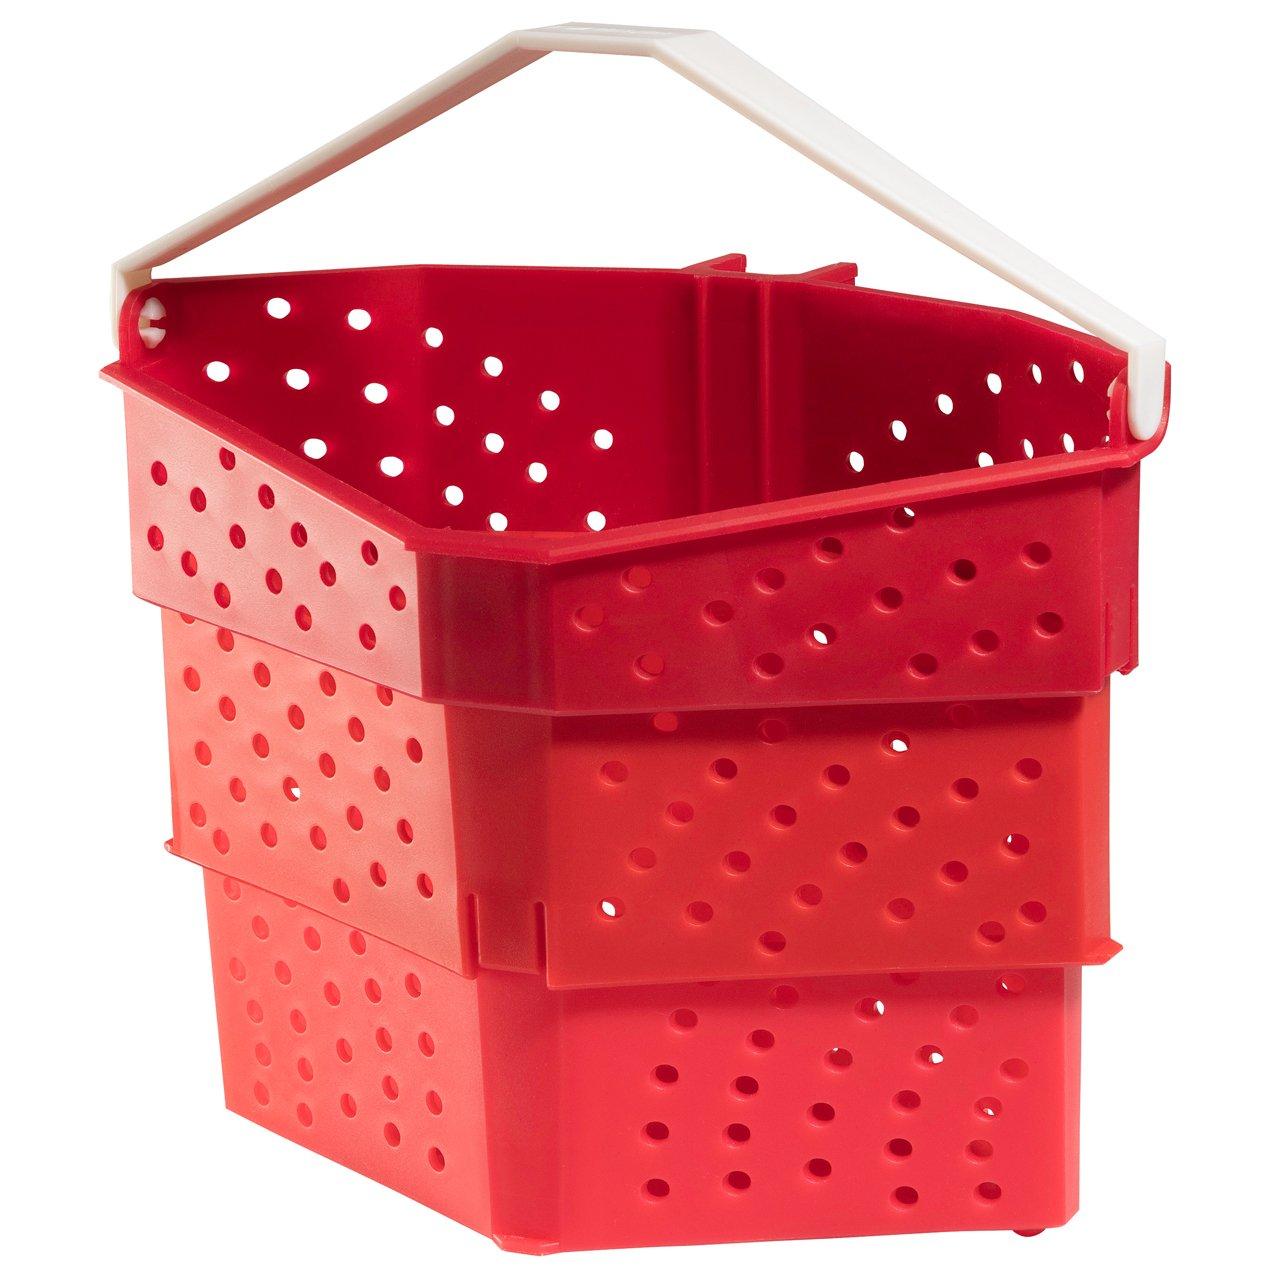 Hutzler 3879RD Steamer Basket, 1 Quart, Red